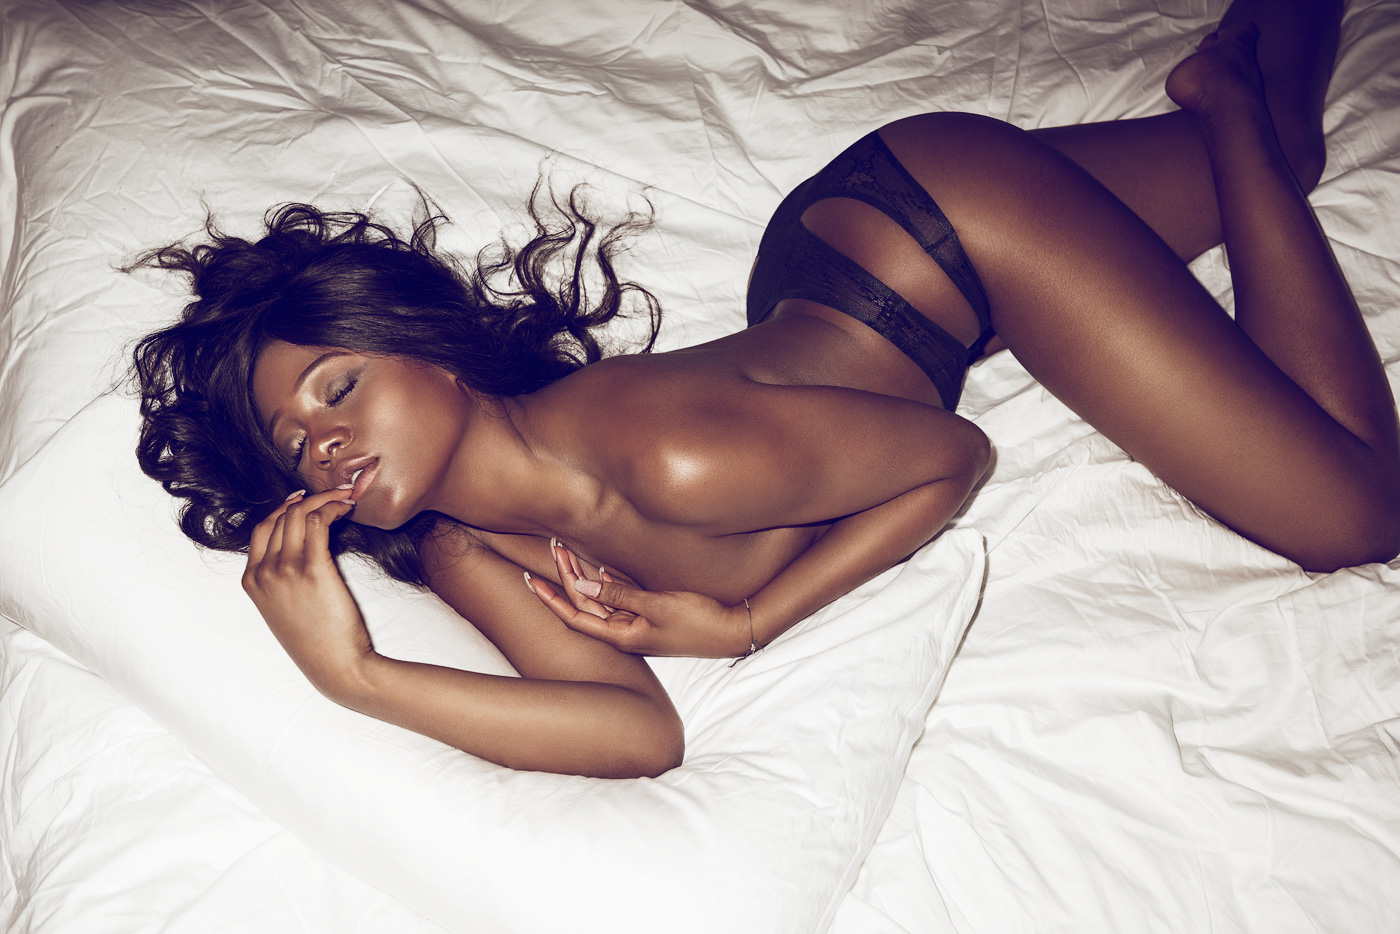 Danielle harris naked in few picture scenes